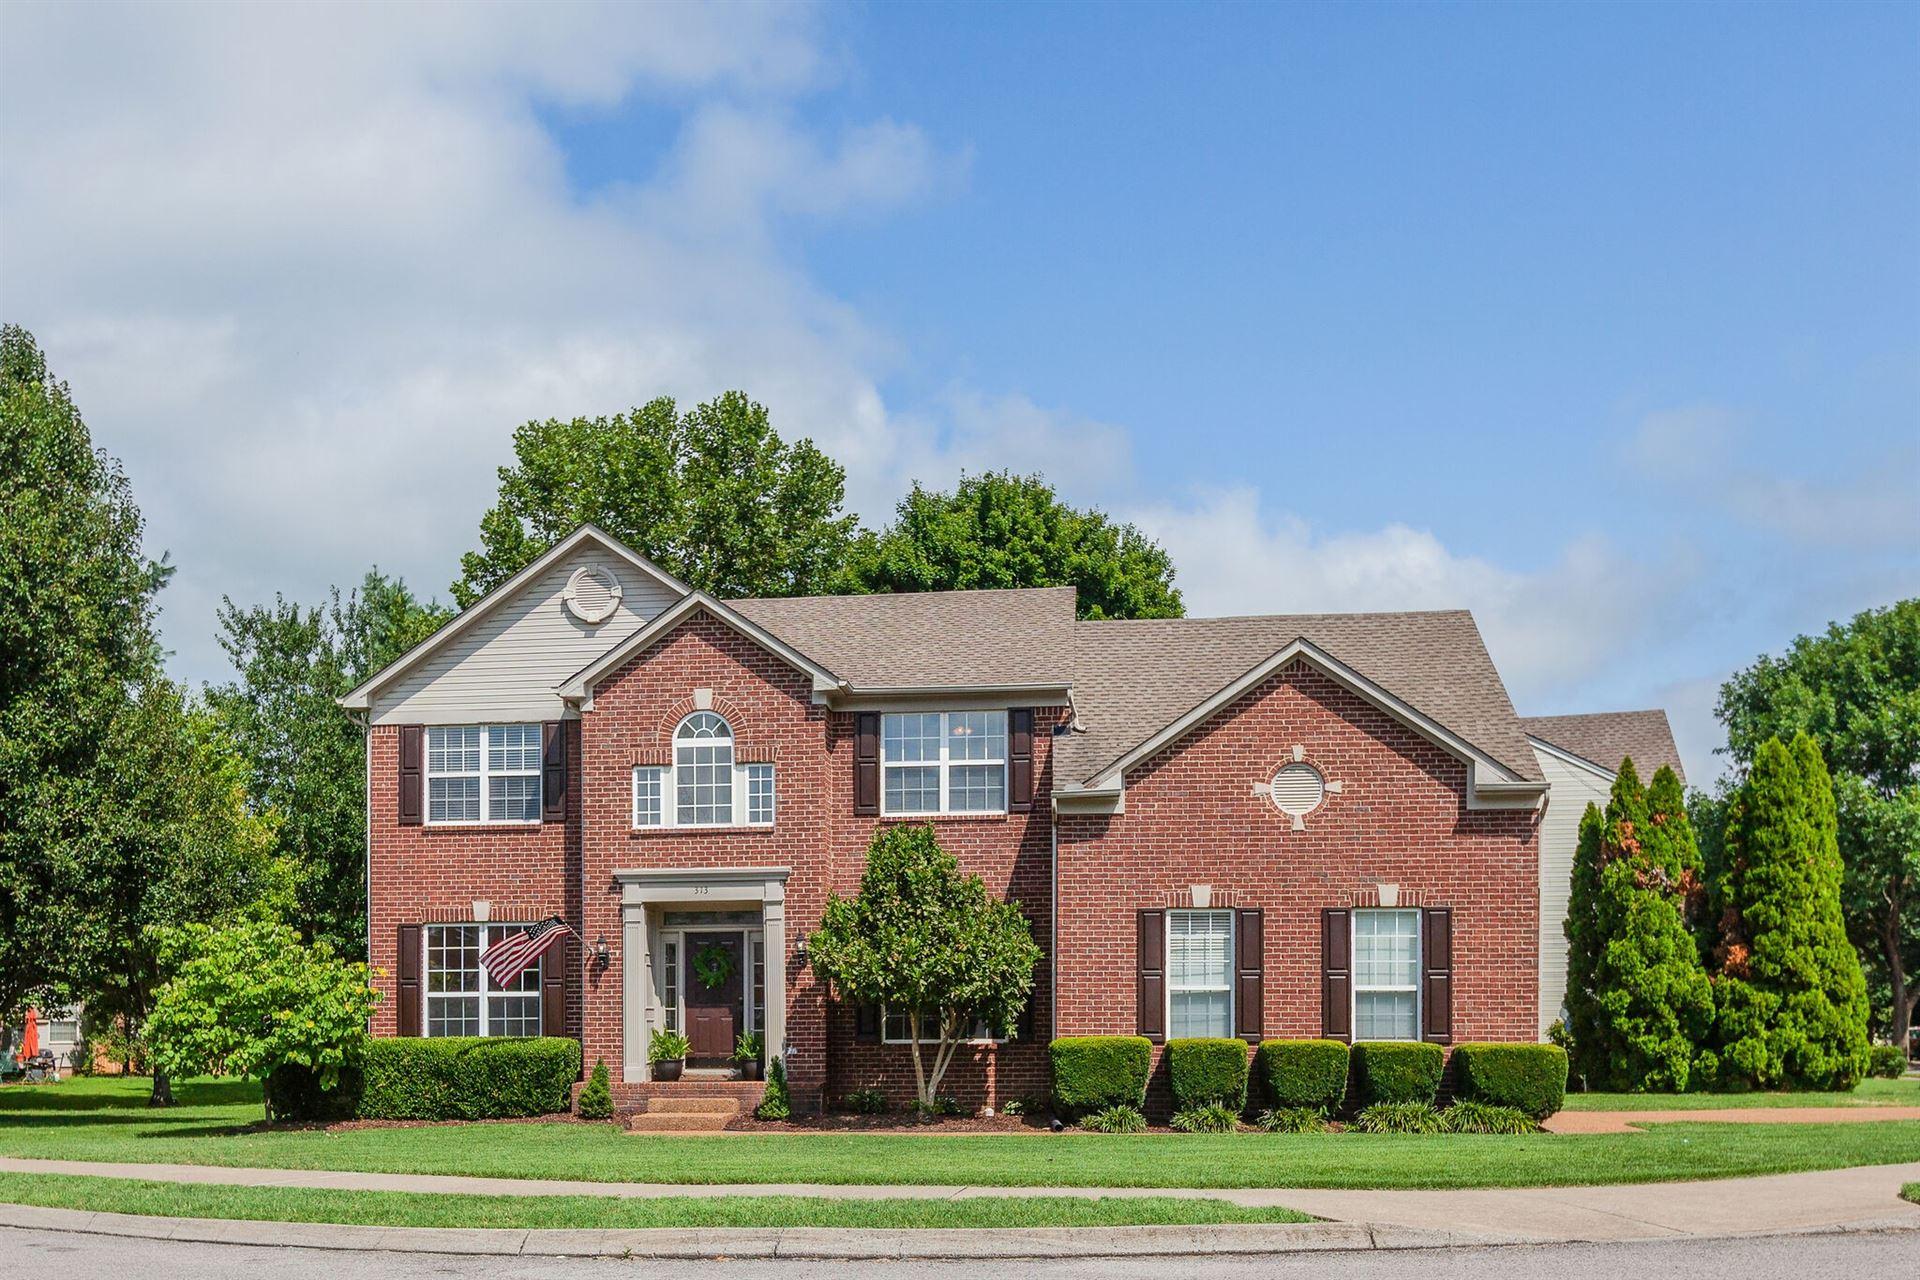 Photo of 313 Devonshire Drive, Franklin, TN 37064 (MLS # 2176978)